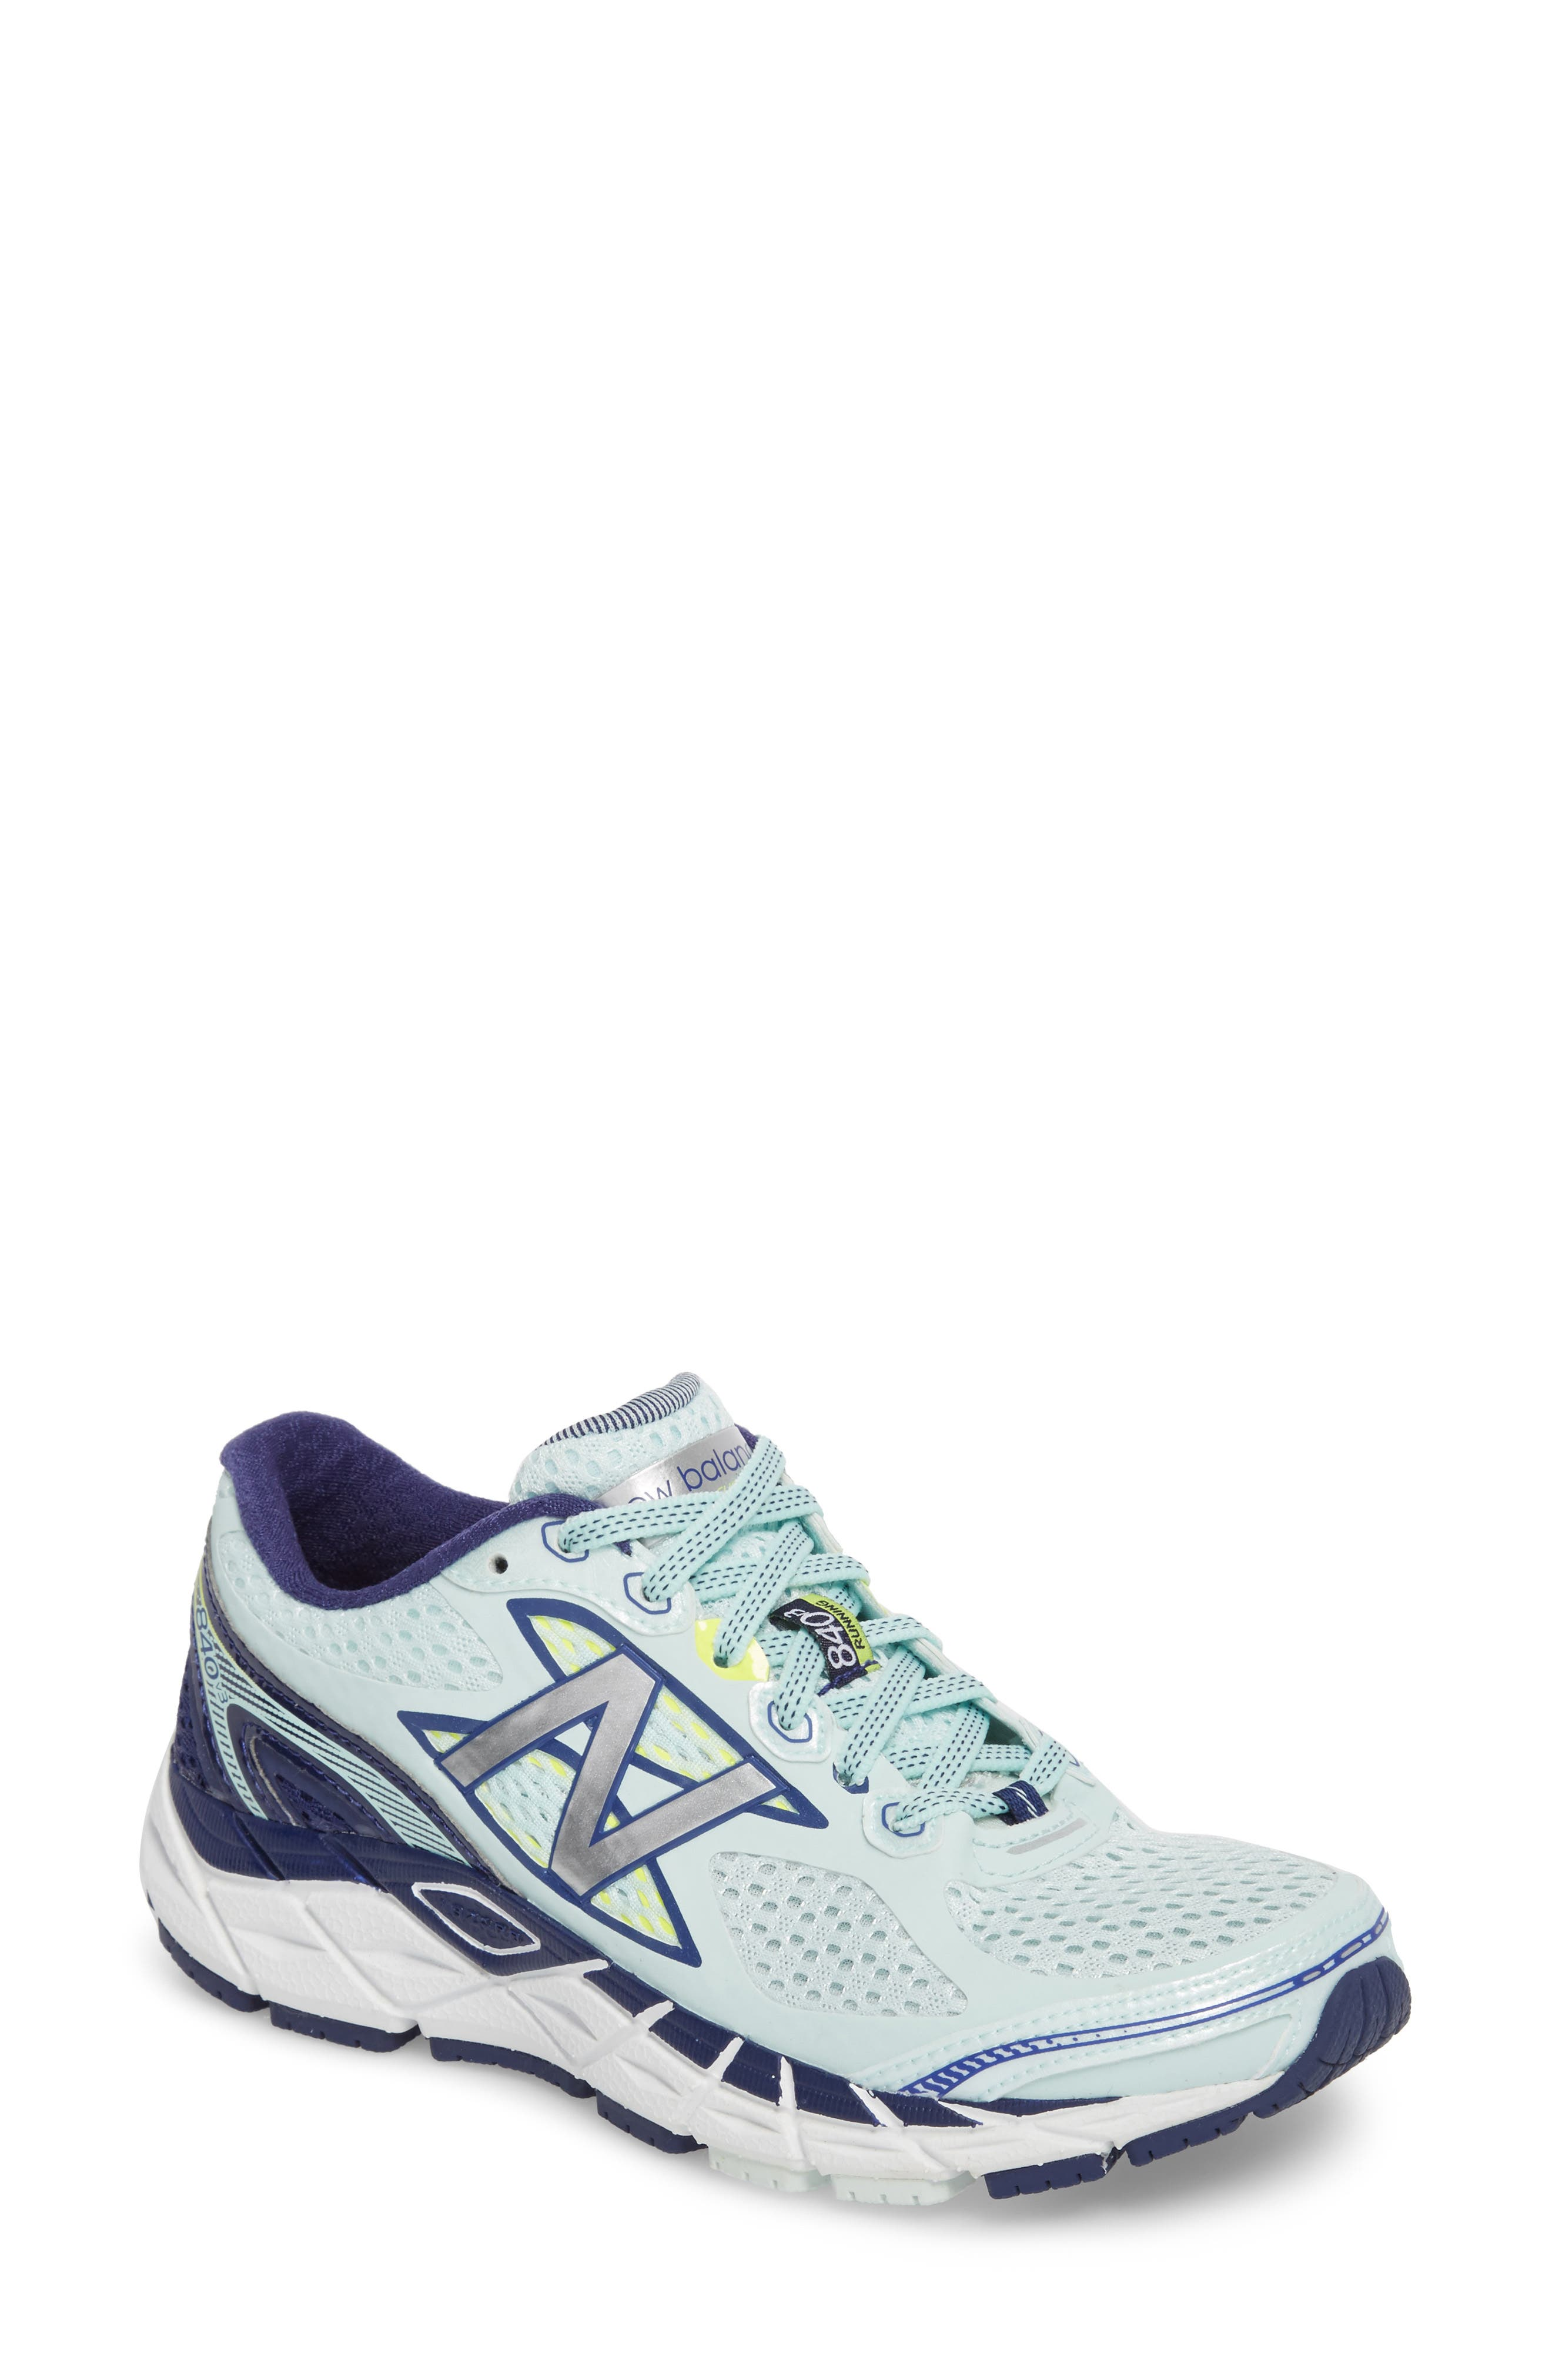 '840v3' Running Shoe,                             Main thumbnail 1, color,                             487